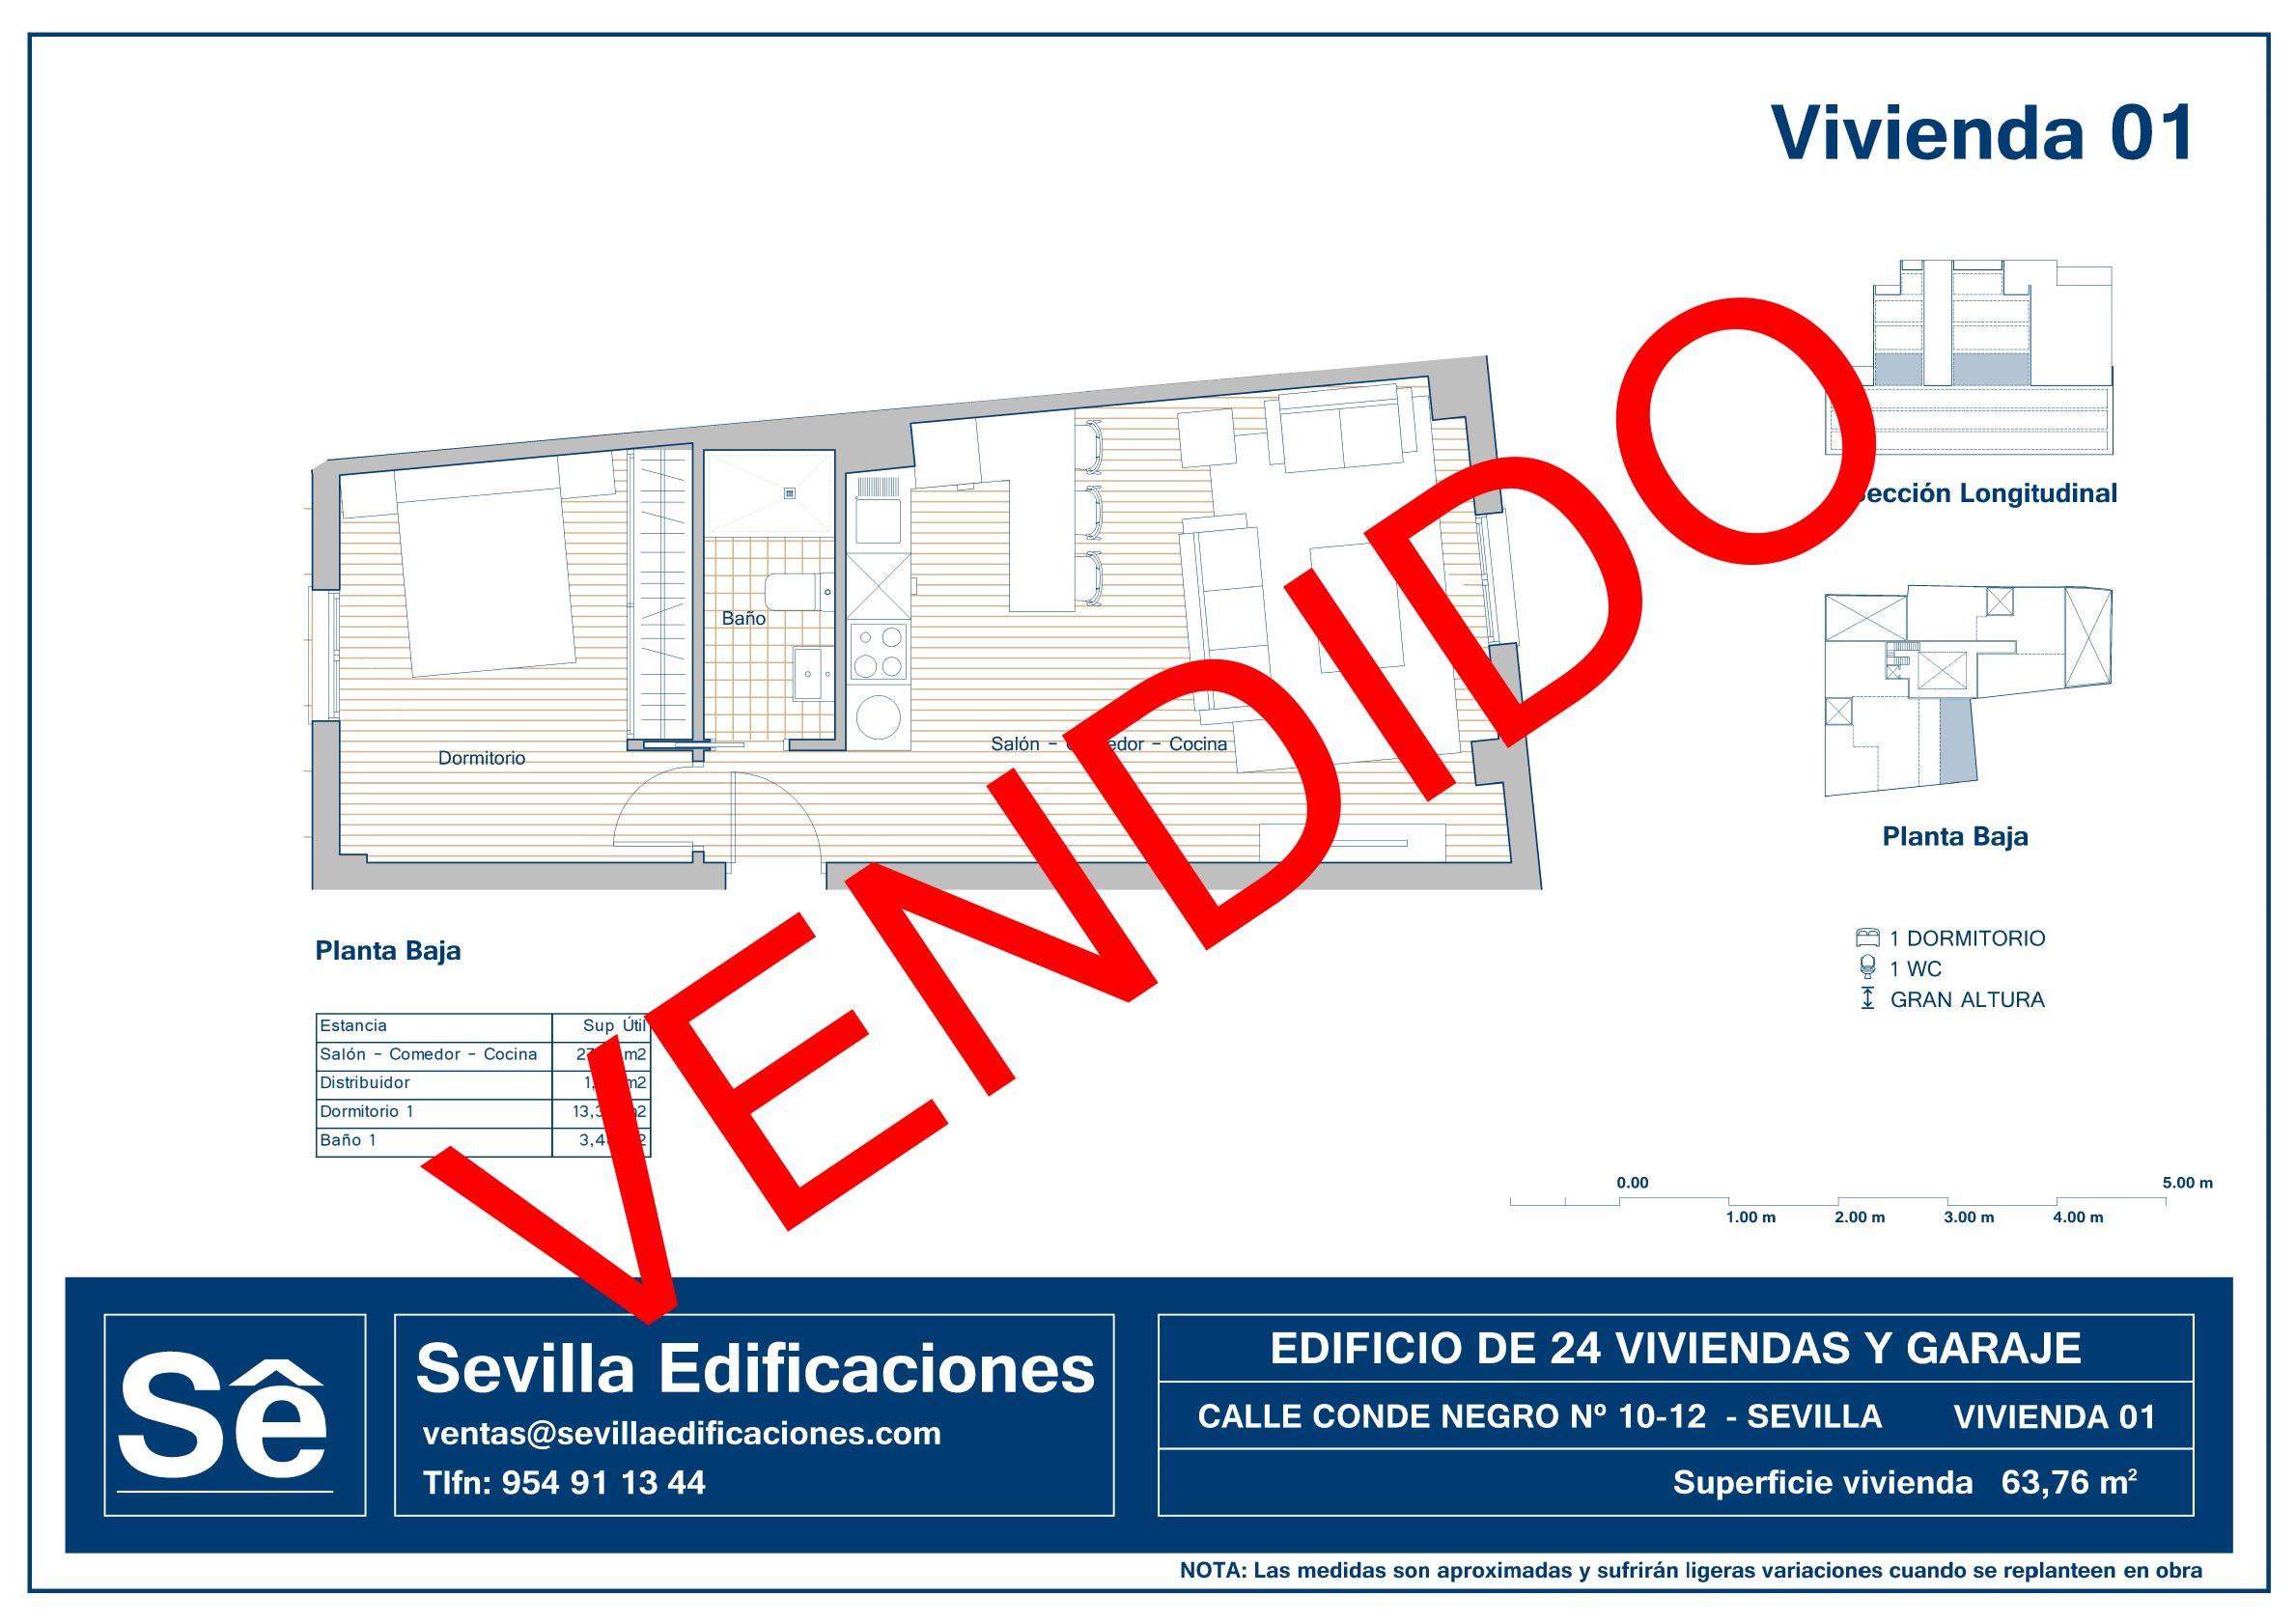 CONDENEGRO_VIVIENDA_01_VENDIDO